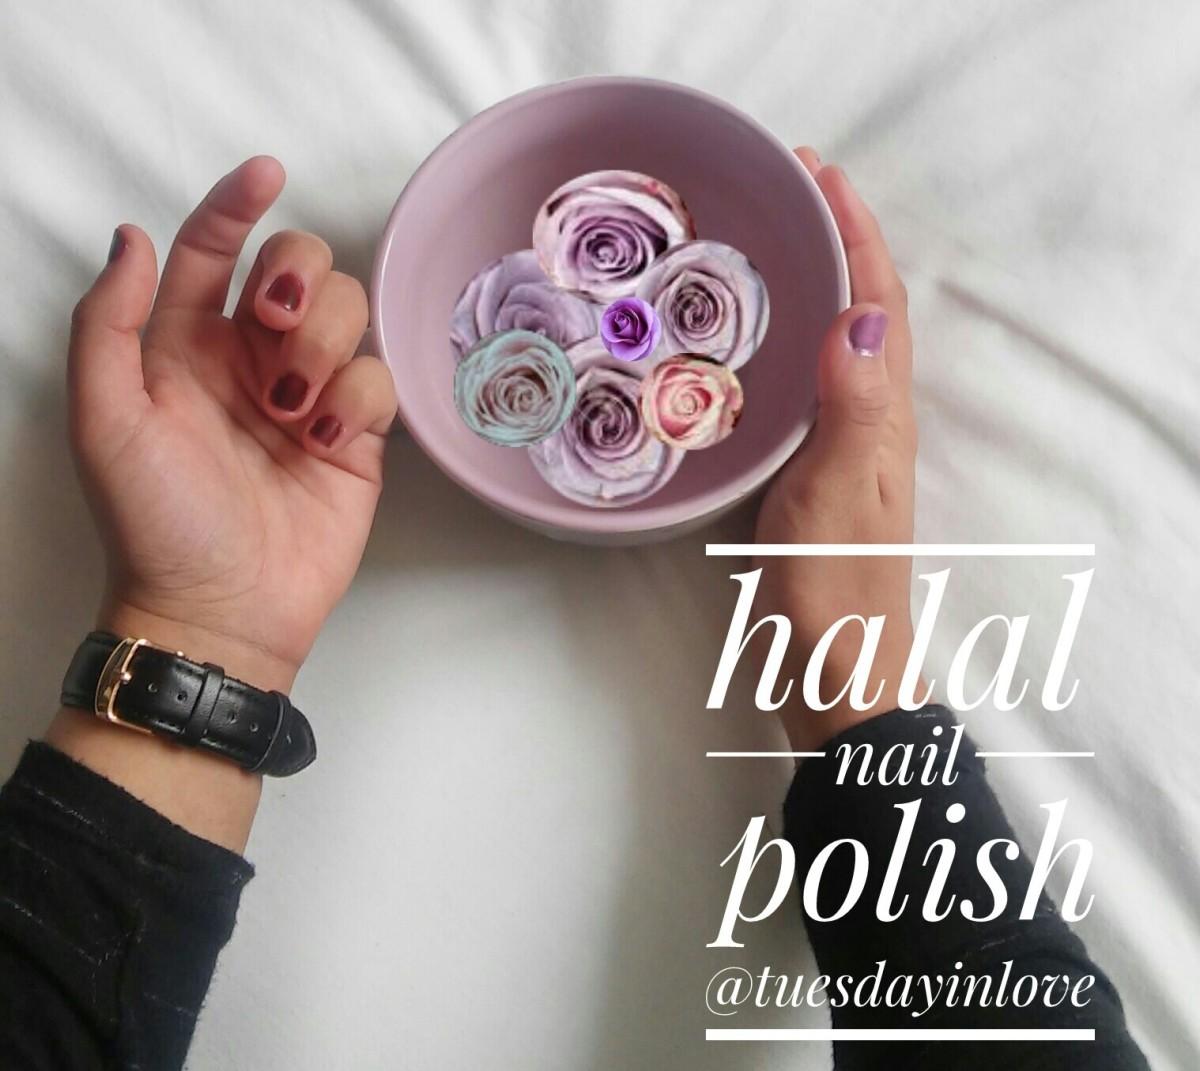 Halal Nail Polish: Tuesday In Love